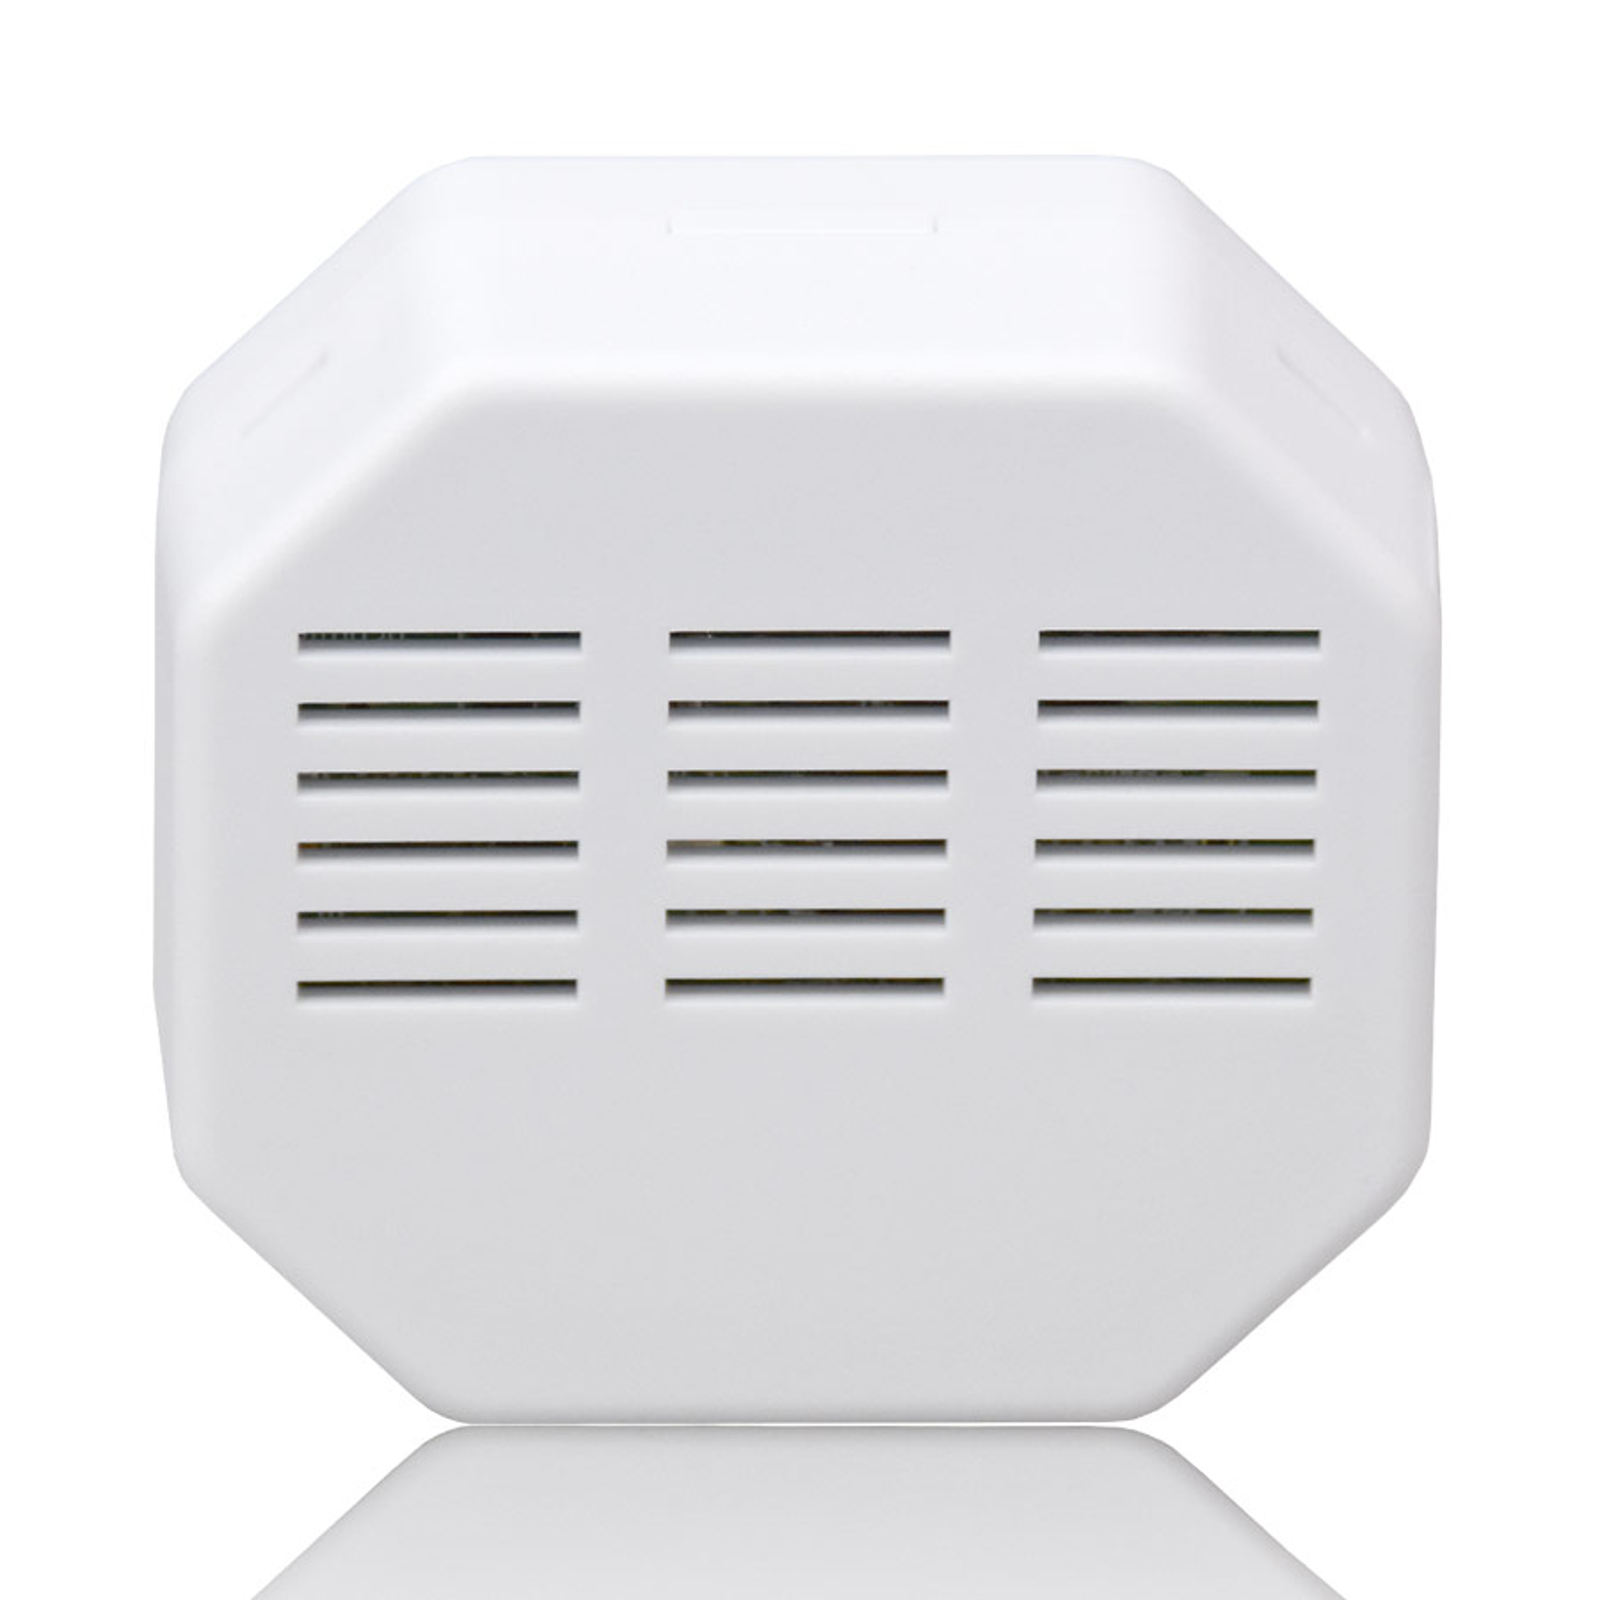 Blaupunkt RRM2-S1 relais Smart Home série Q